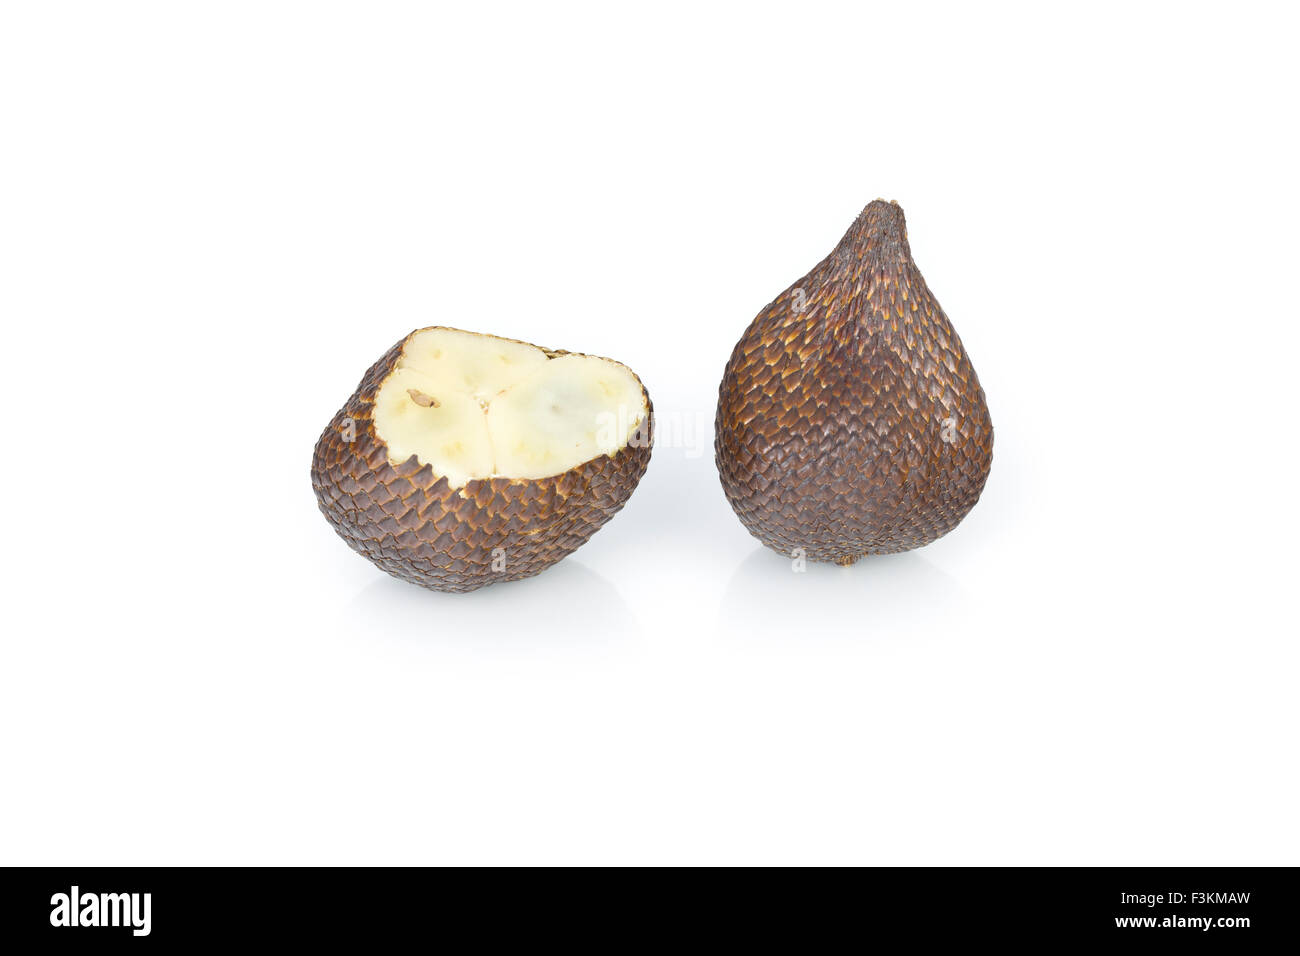 Salak or snake skin fruit, fruit of the Salak palm, Bali, Indonesia - Stock Image